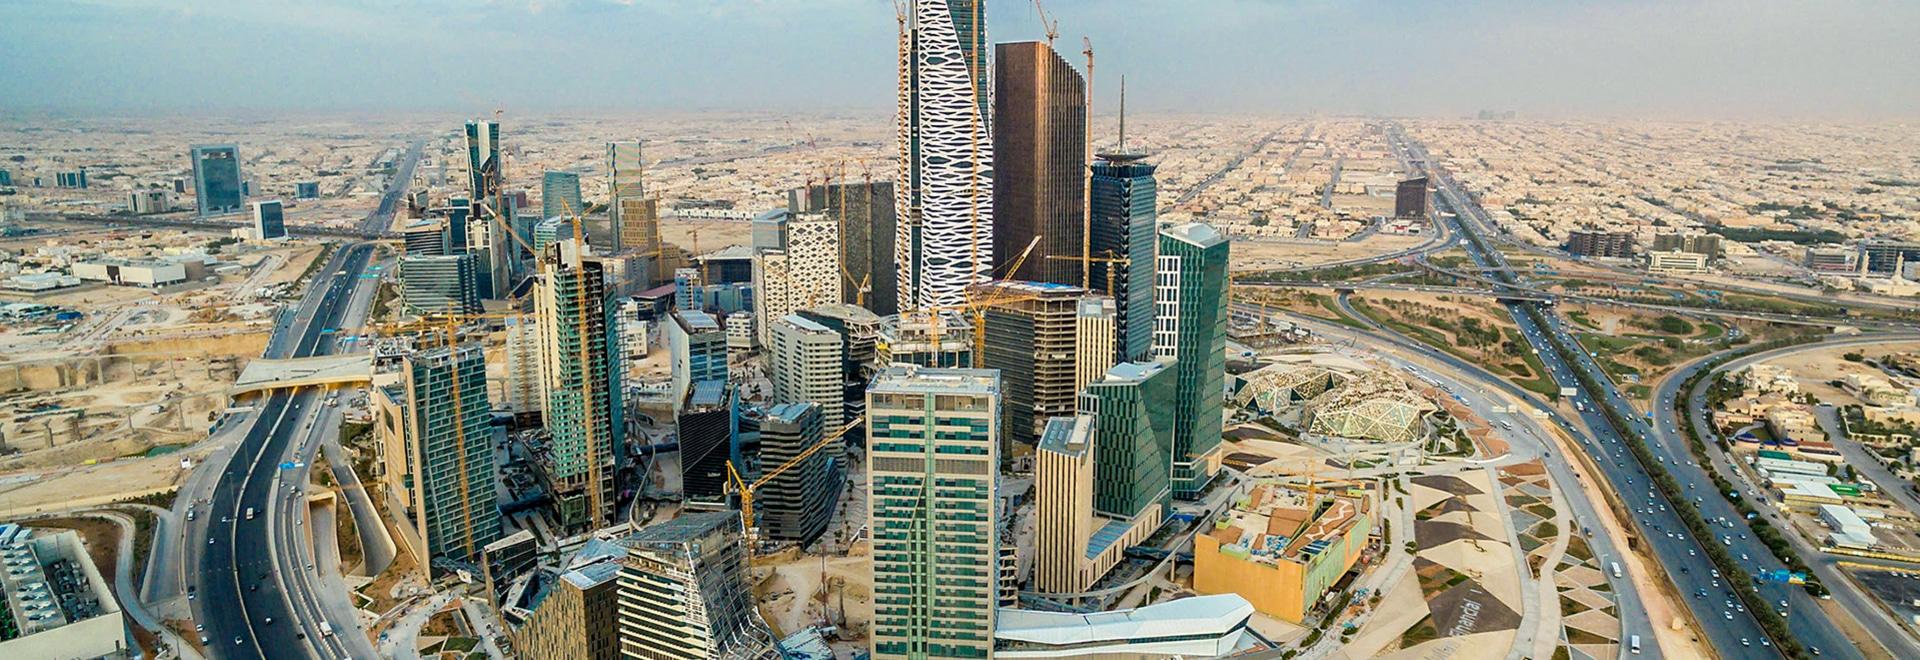 King Abdullah Financial District - Saudi Arabia